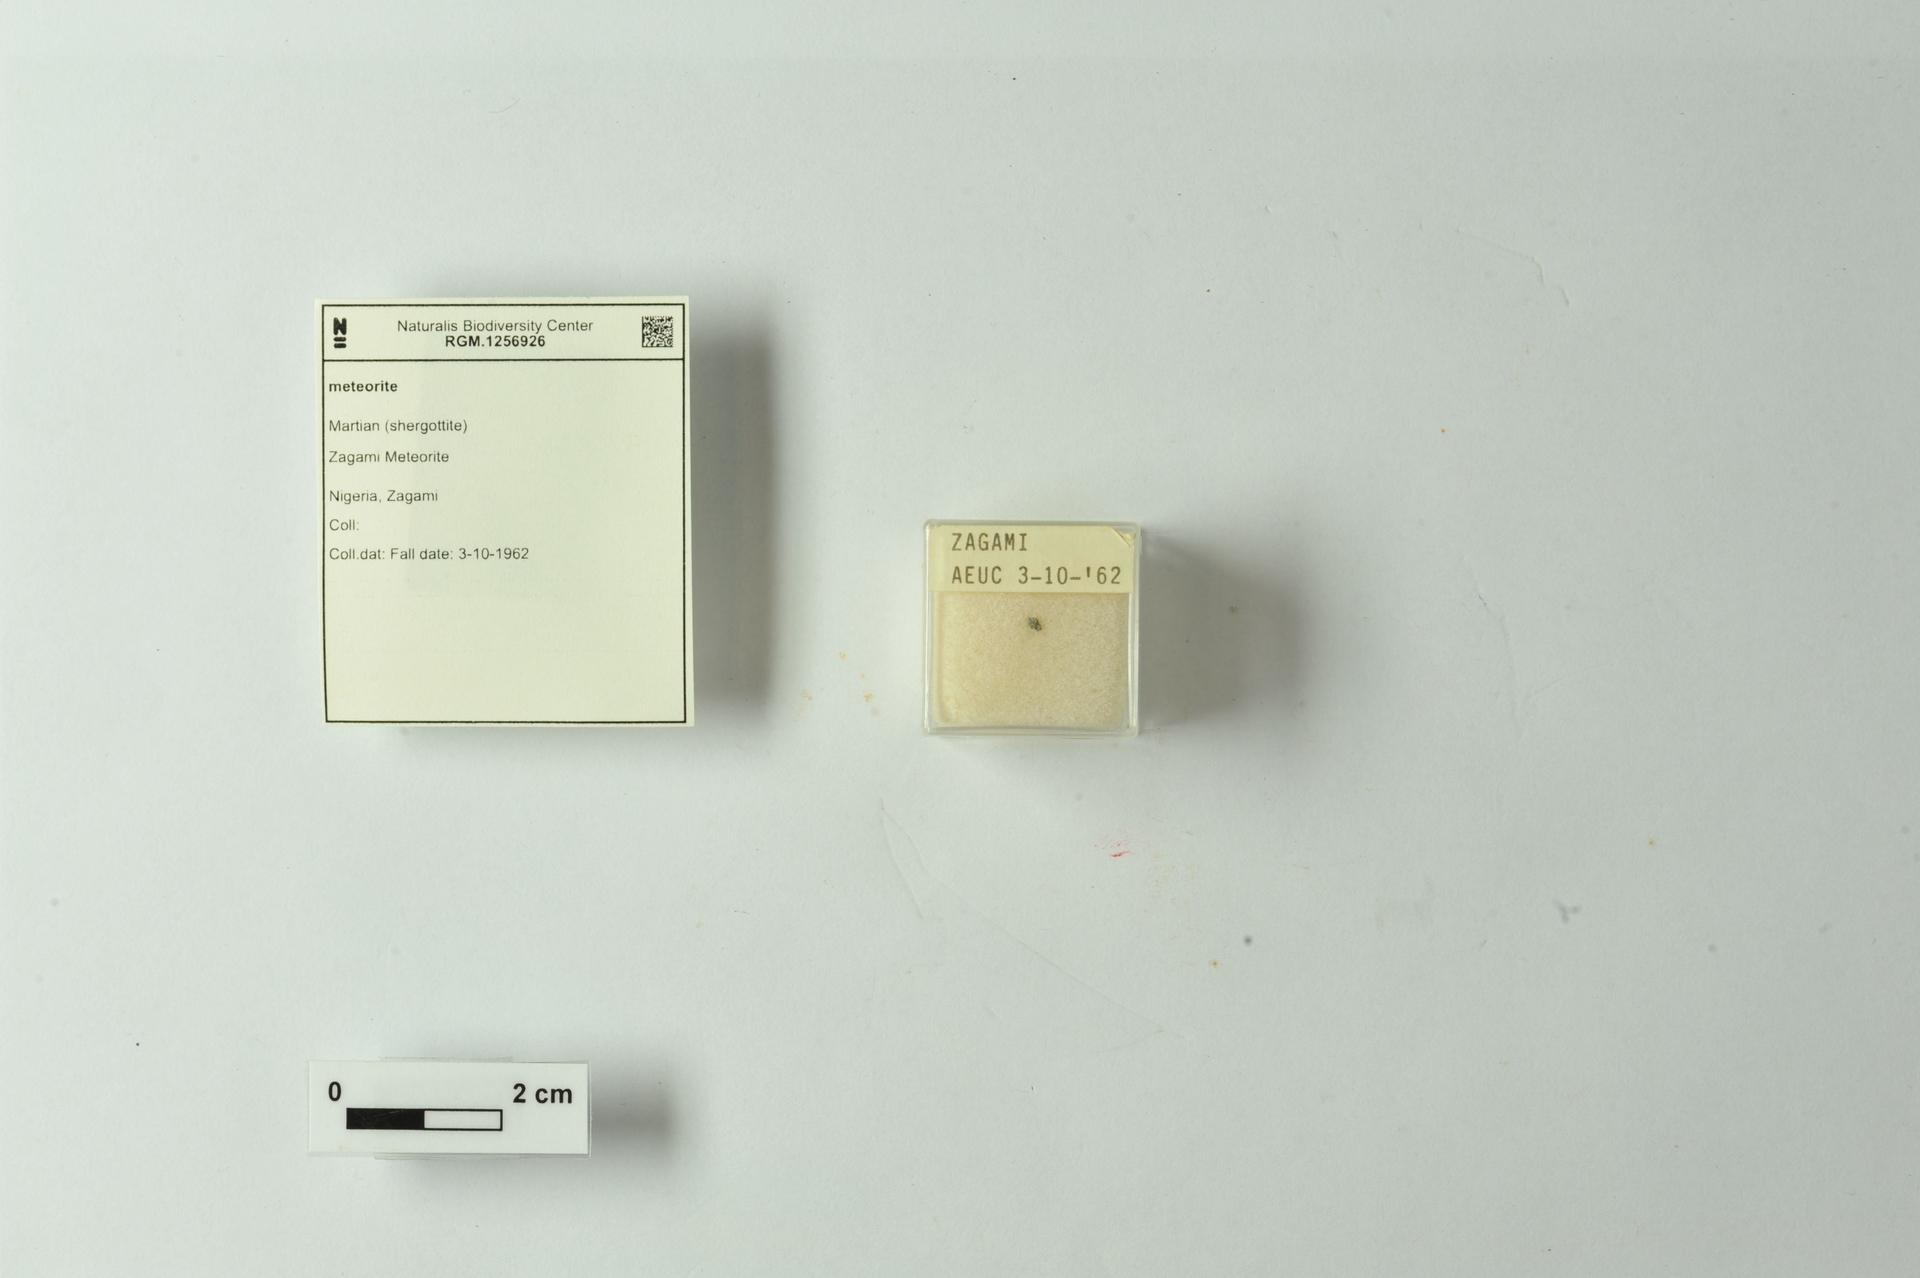 RGM.1256926 | Martian (shergottite)